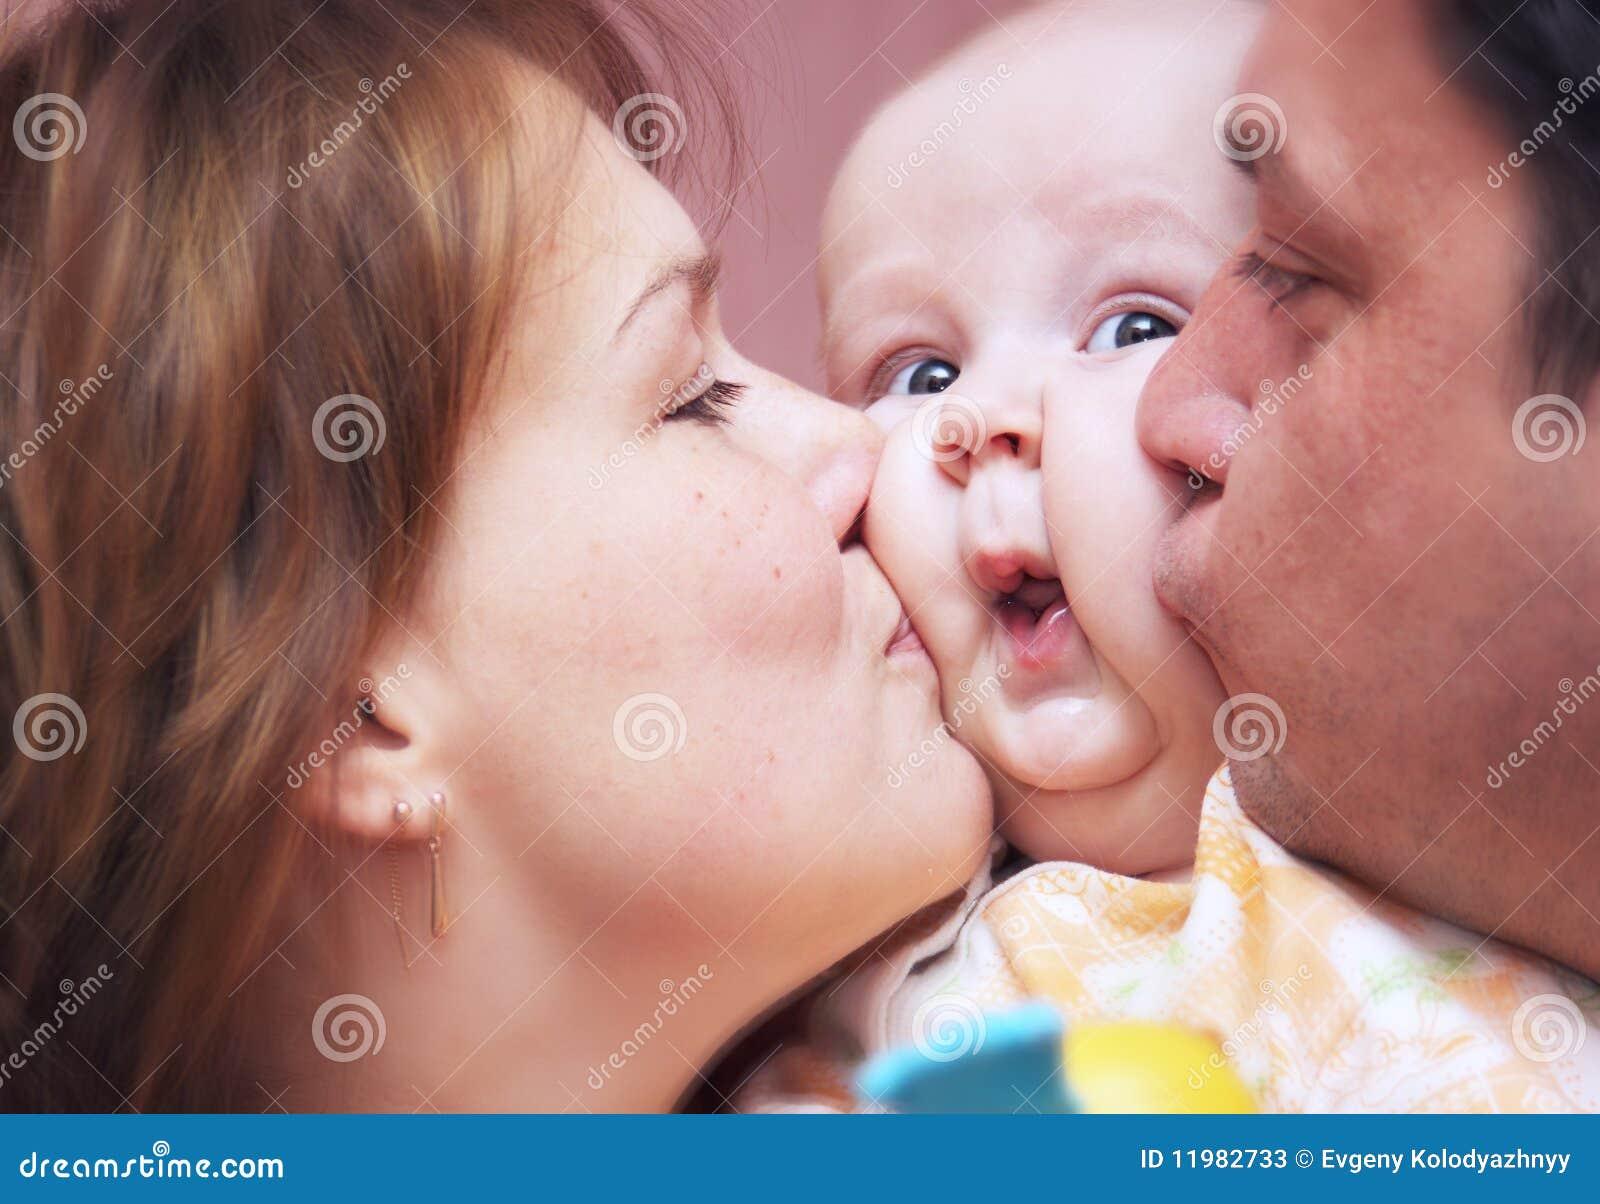 Kissing Family Stock Image  Image Of Kissing  Human